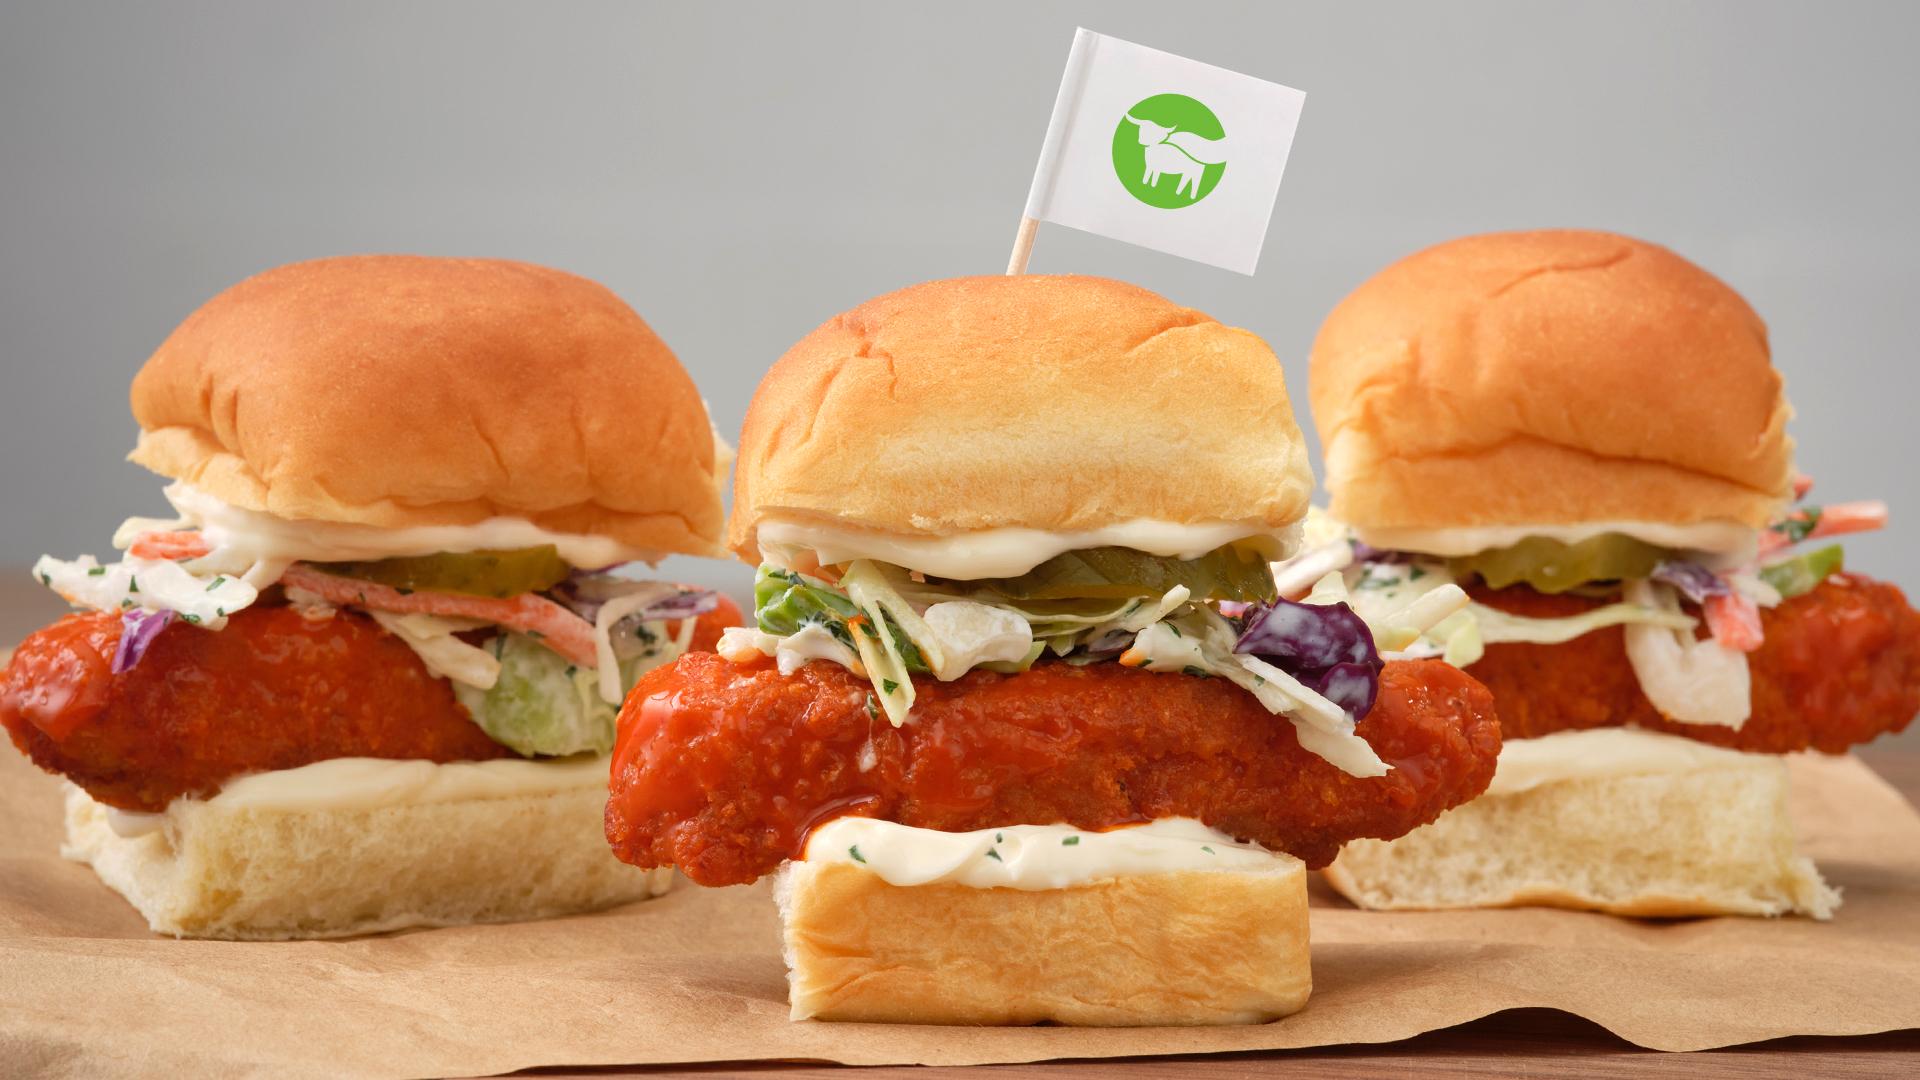 Three plant-based chicken sandwiches on small hamburger-style buns.